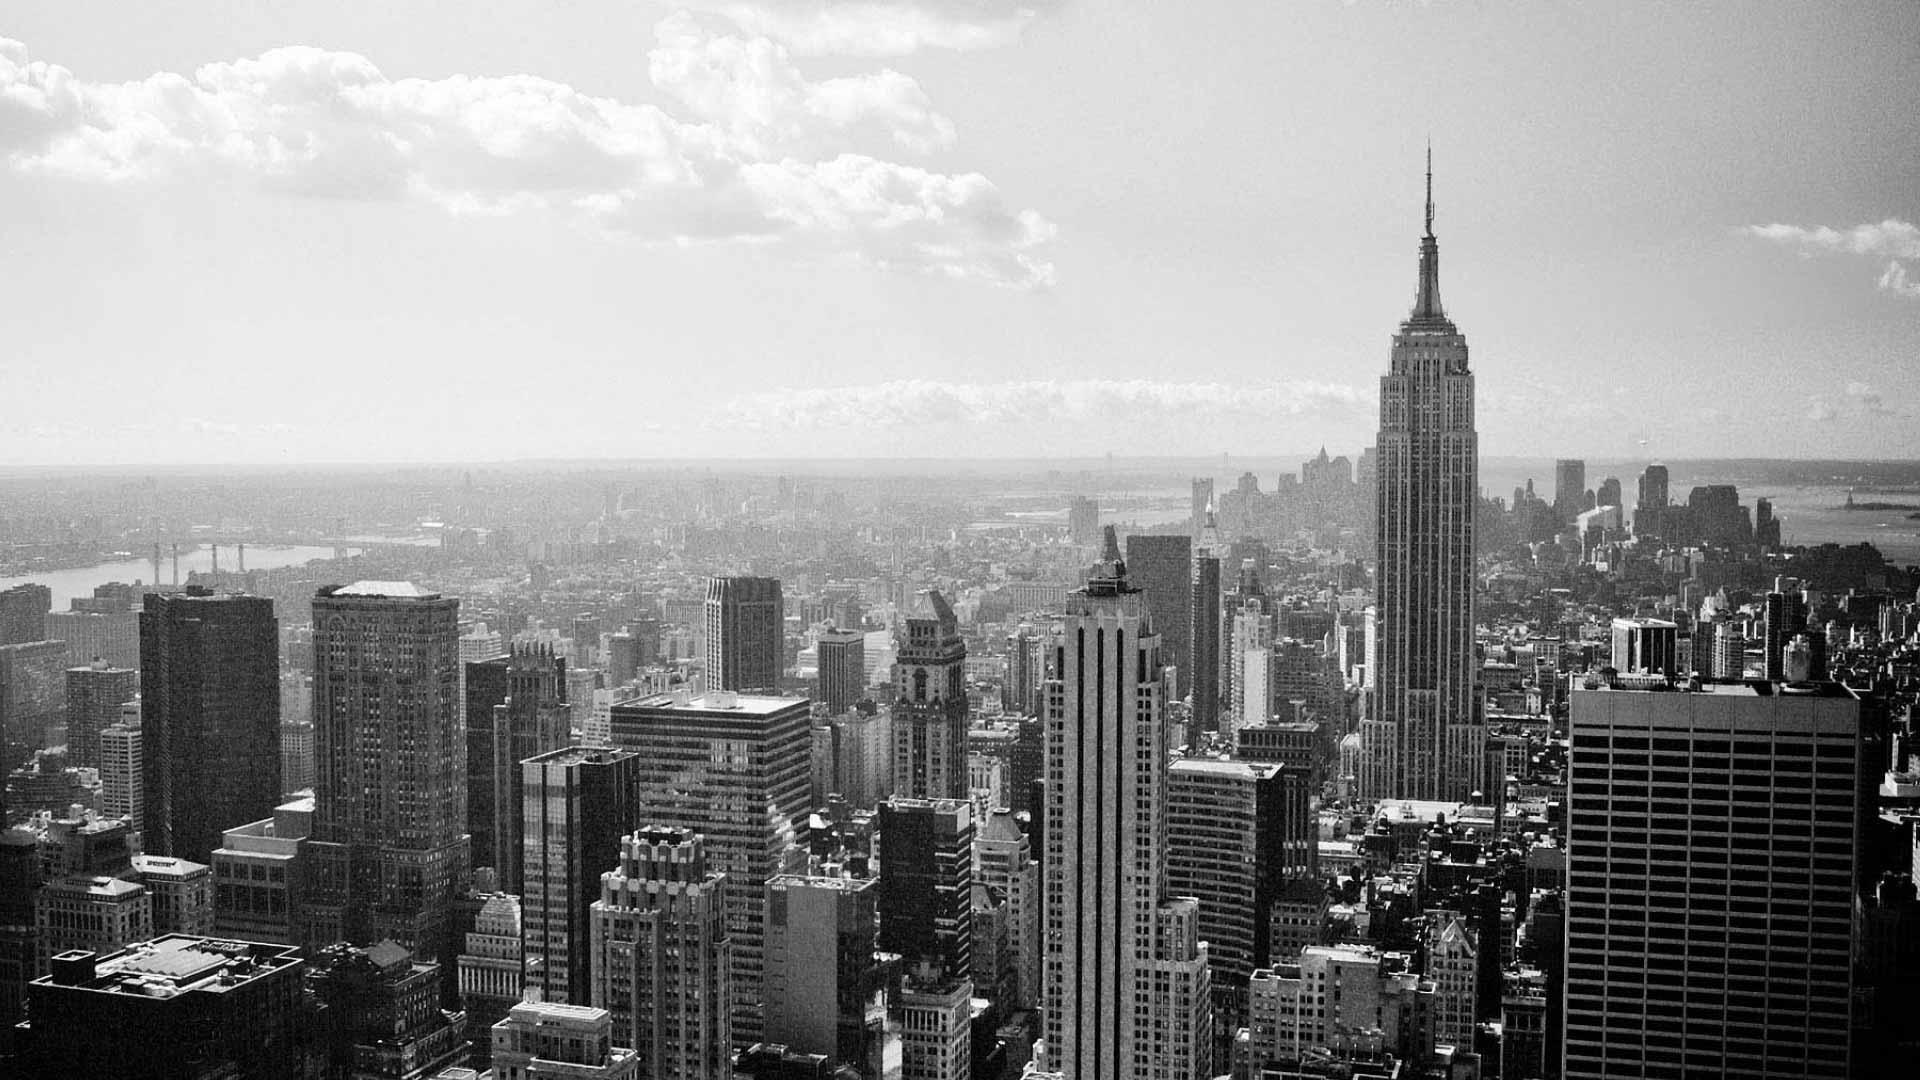 newyorkbg